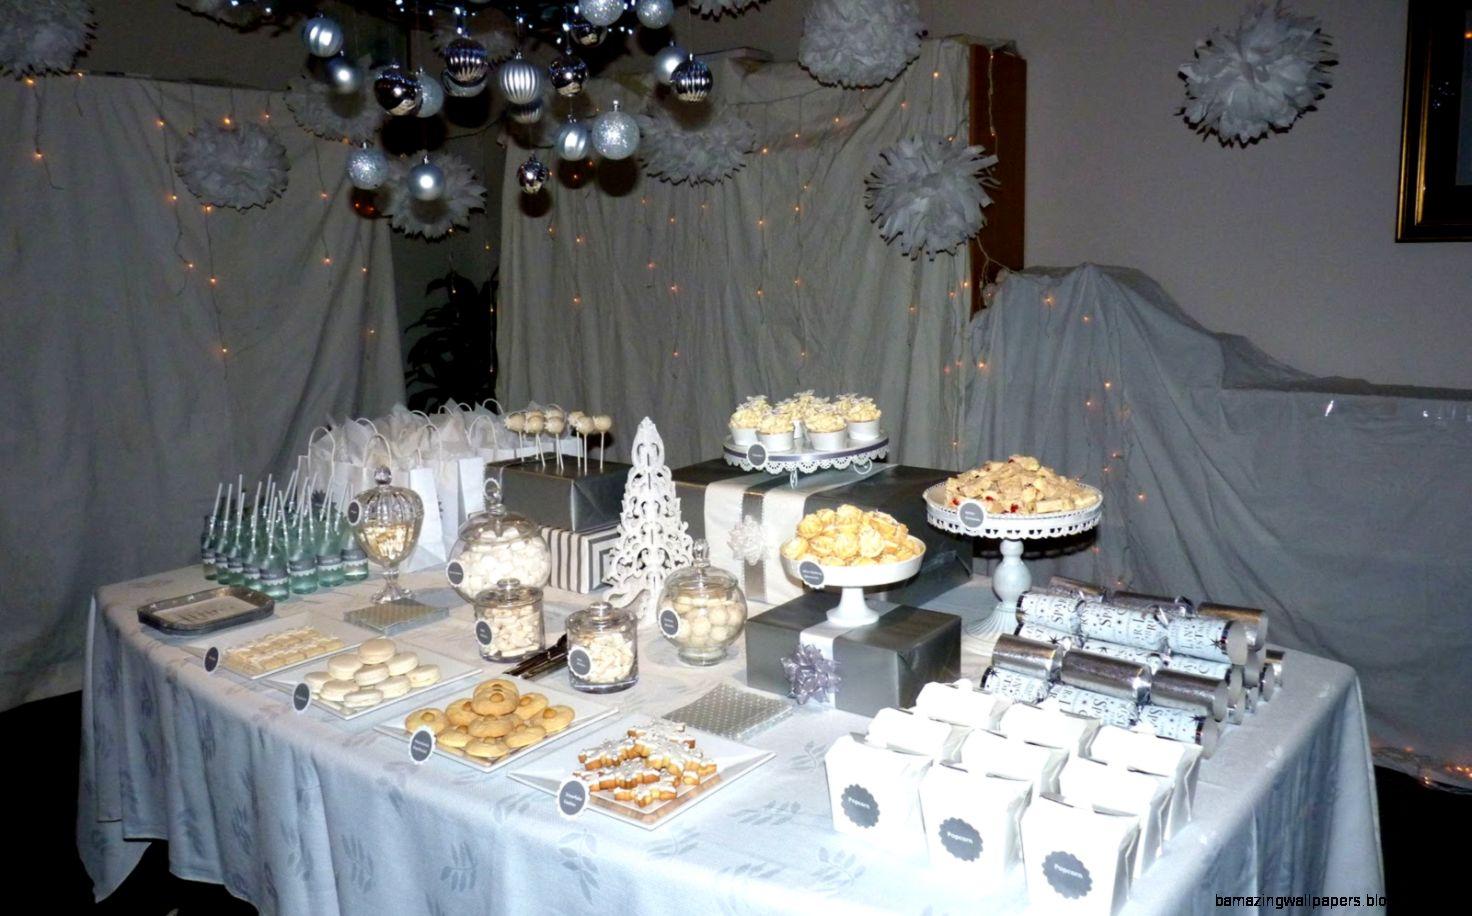 Winter Wonderland Christmas Theme DecorationBubble and Sweet